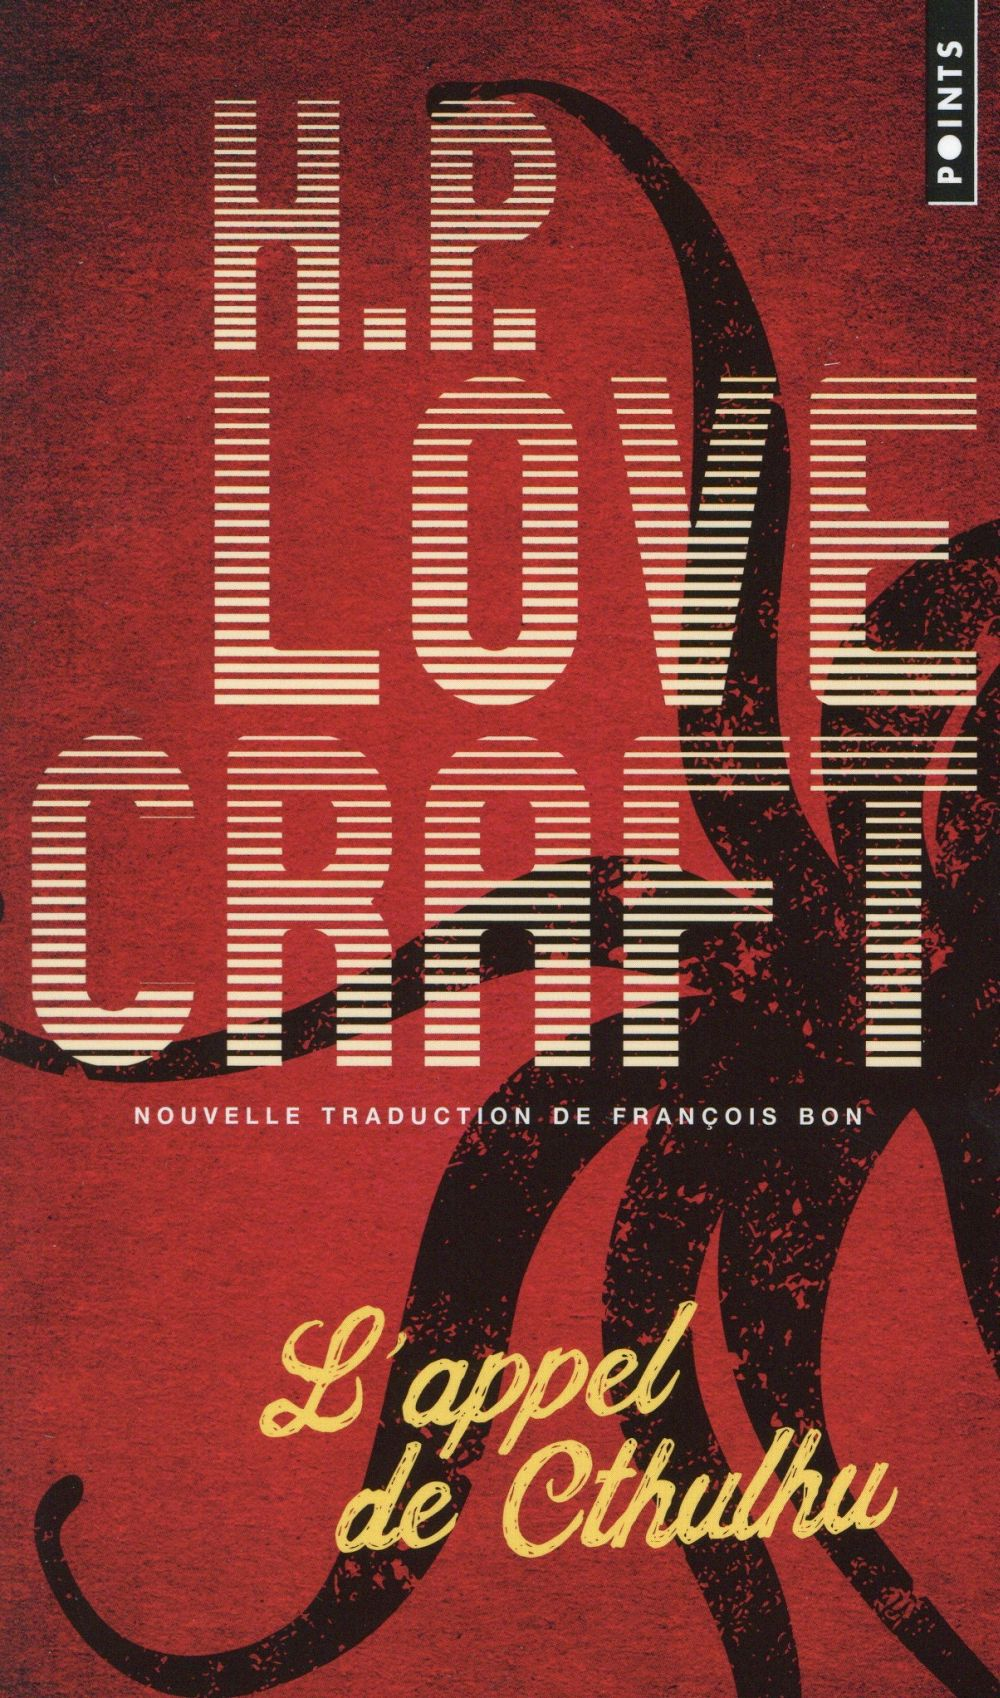 Lovecraft Howard Phillips - L'APPEL DE CTHULHU